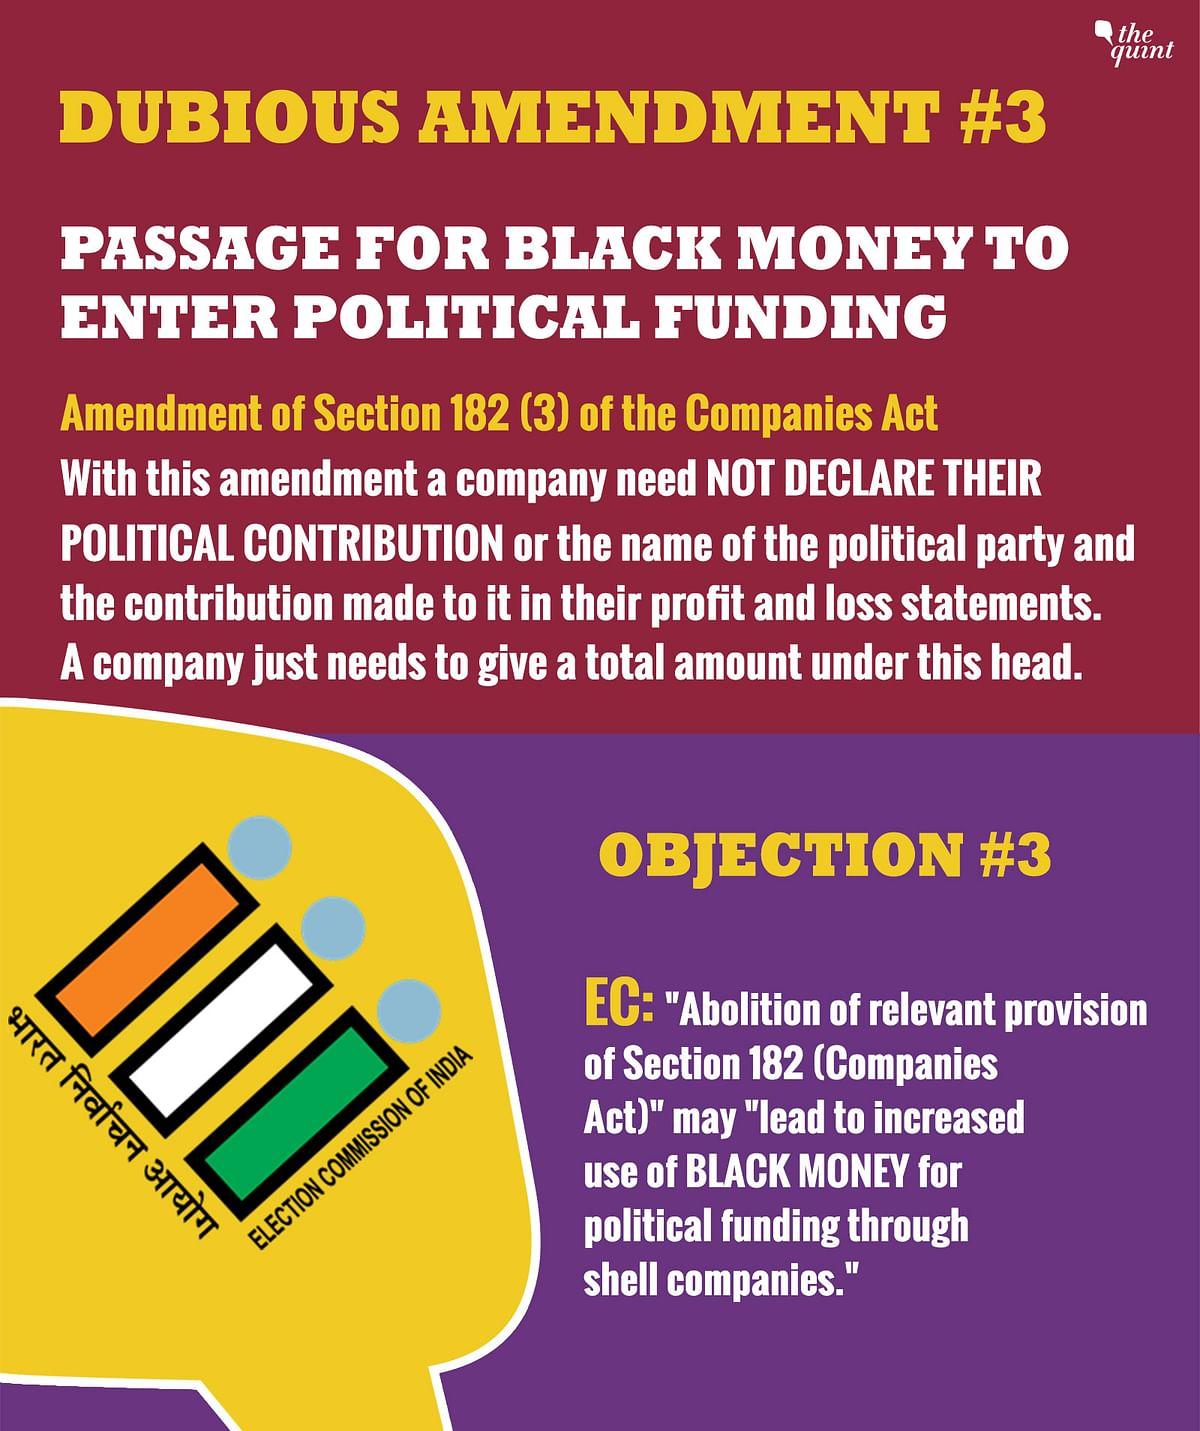 Election Commission on Electoral Bonds: